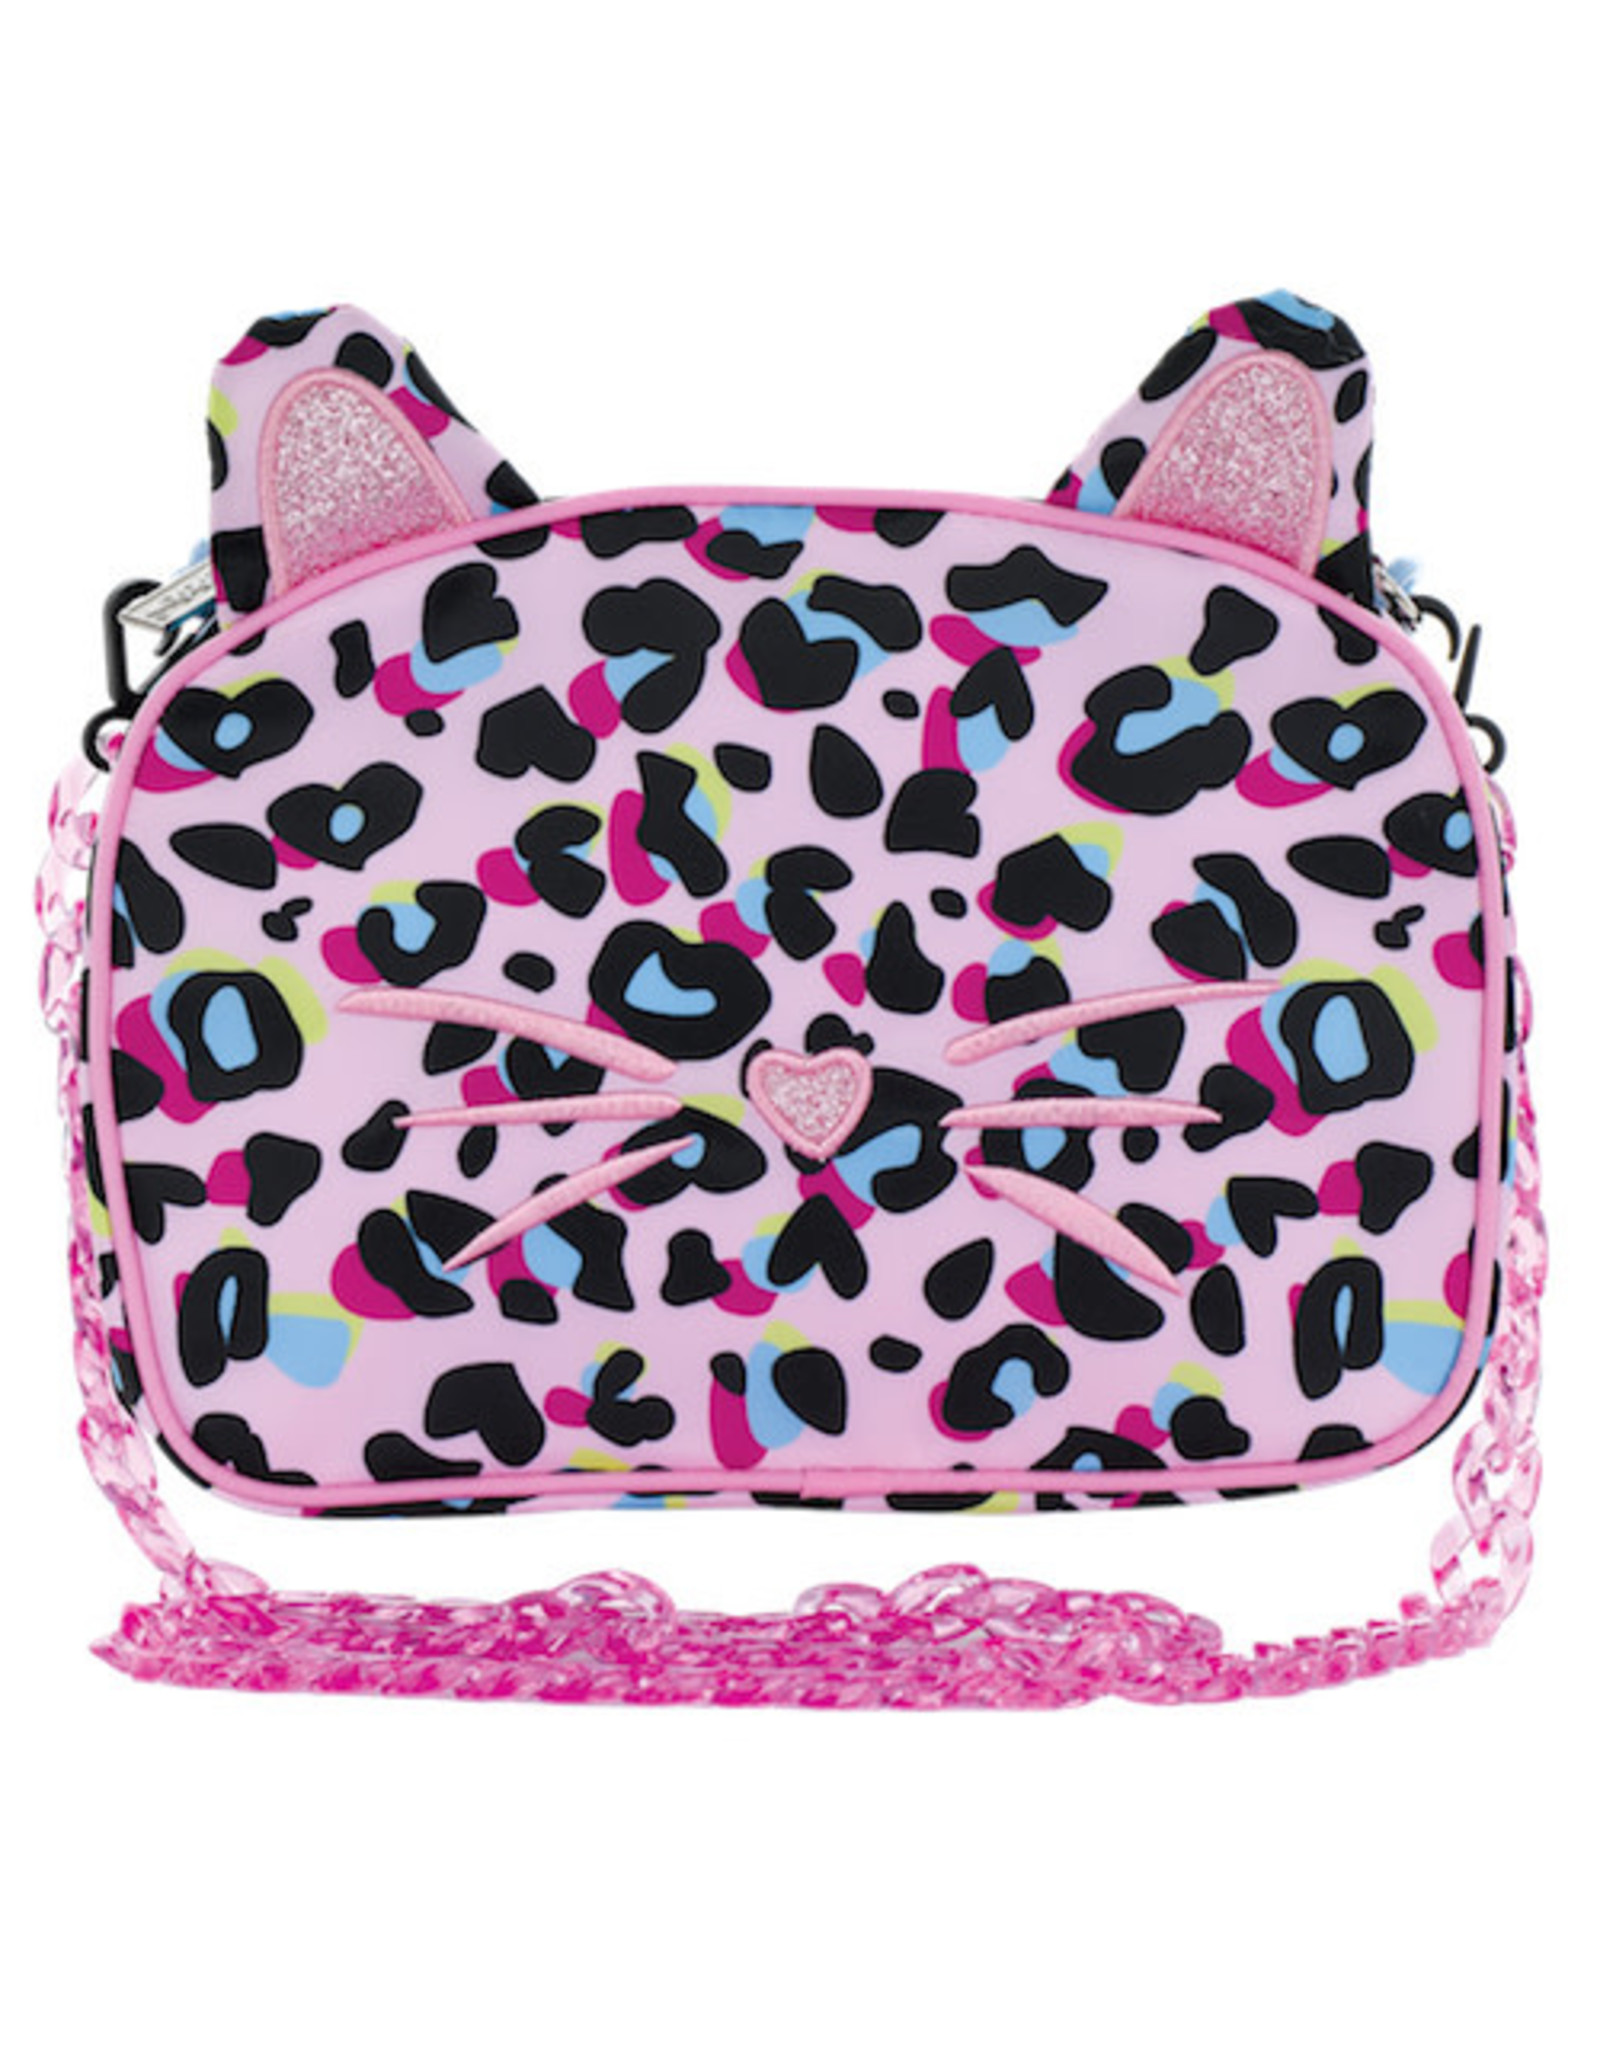 Iscream Pink Leopard Crossbody Bag